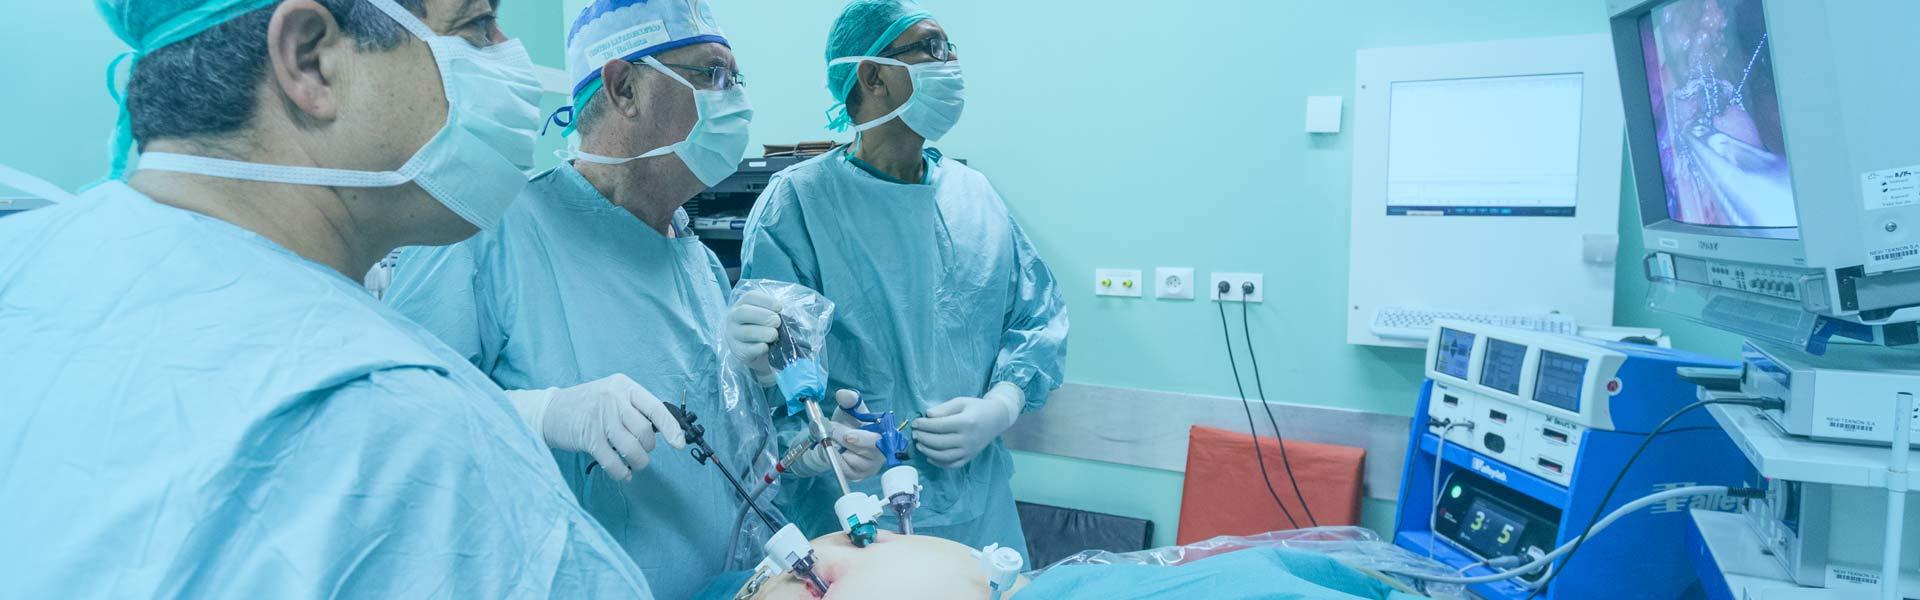 banner-cirugia-obesidad